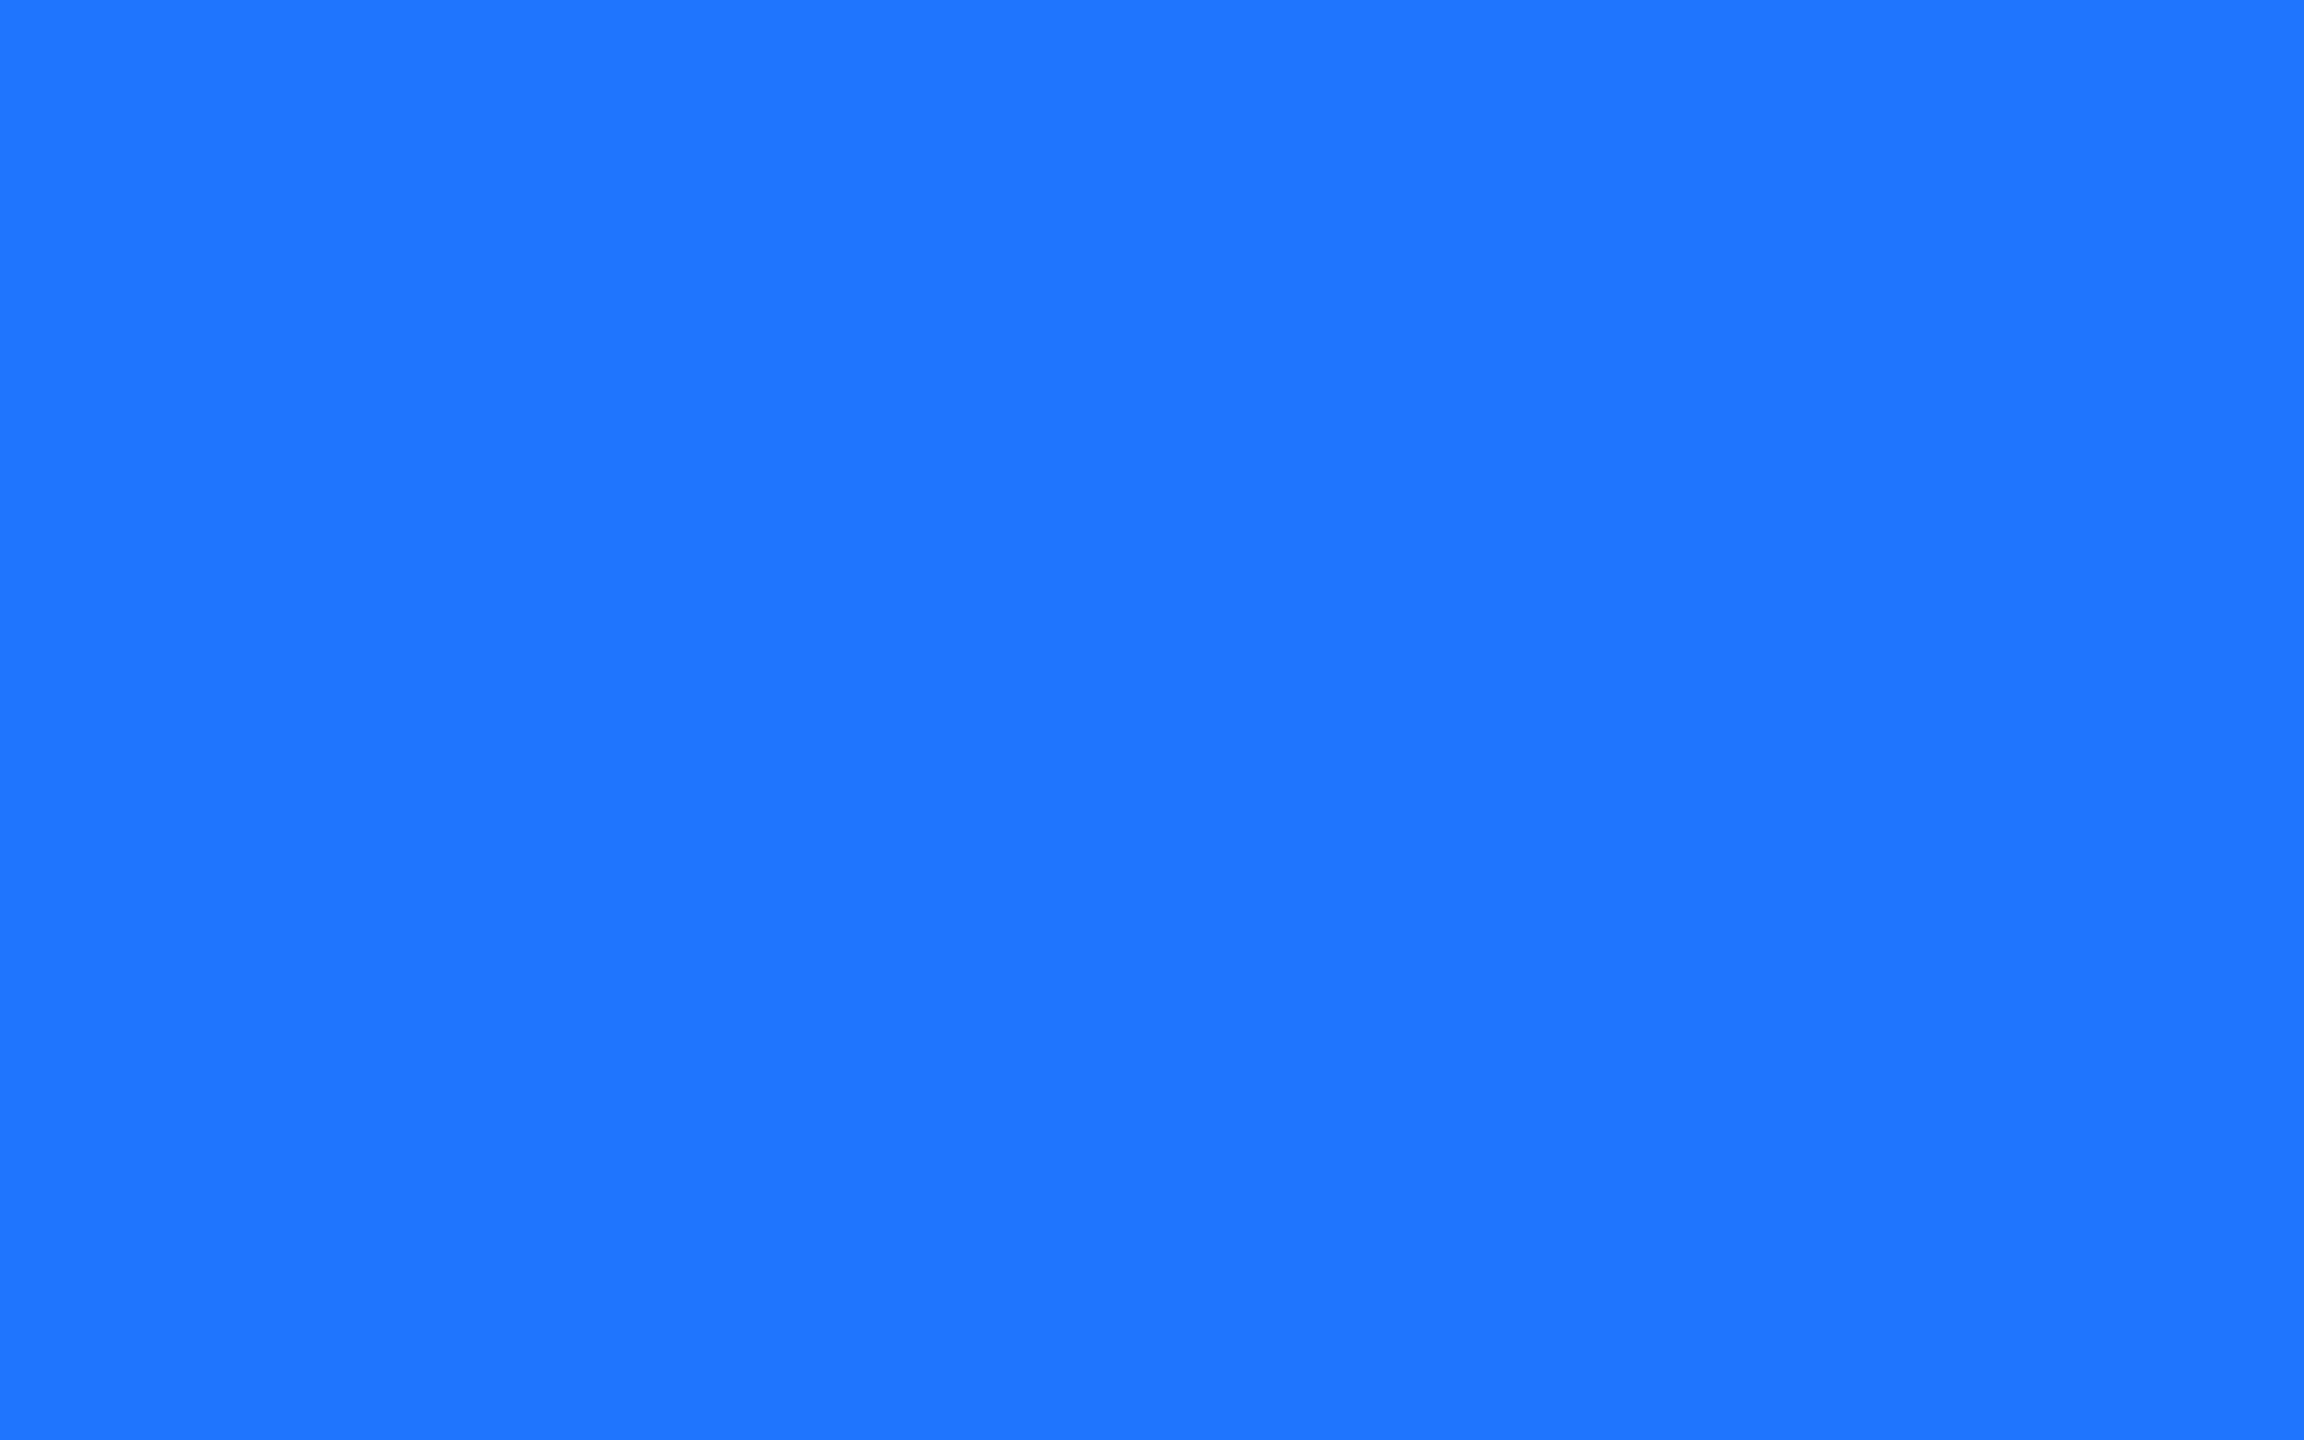 2304x1440 Blue Crayola Solid Color Background